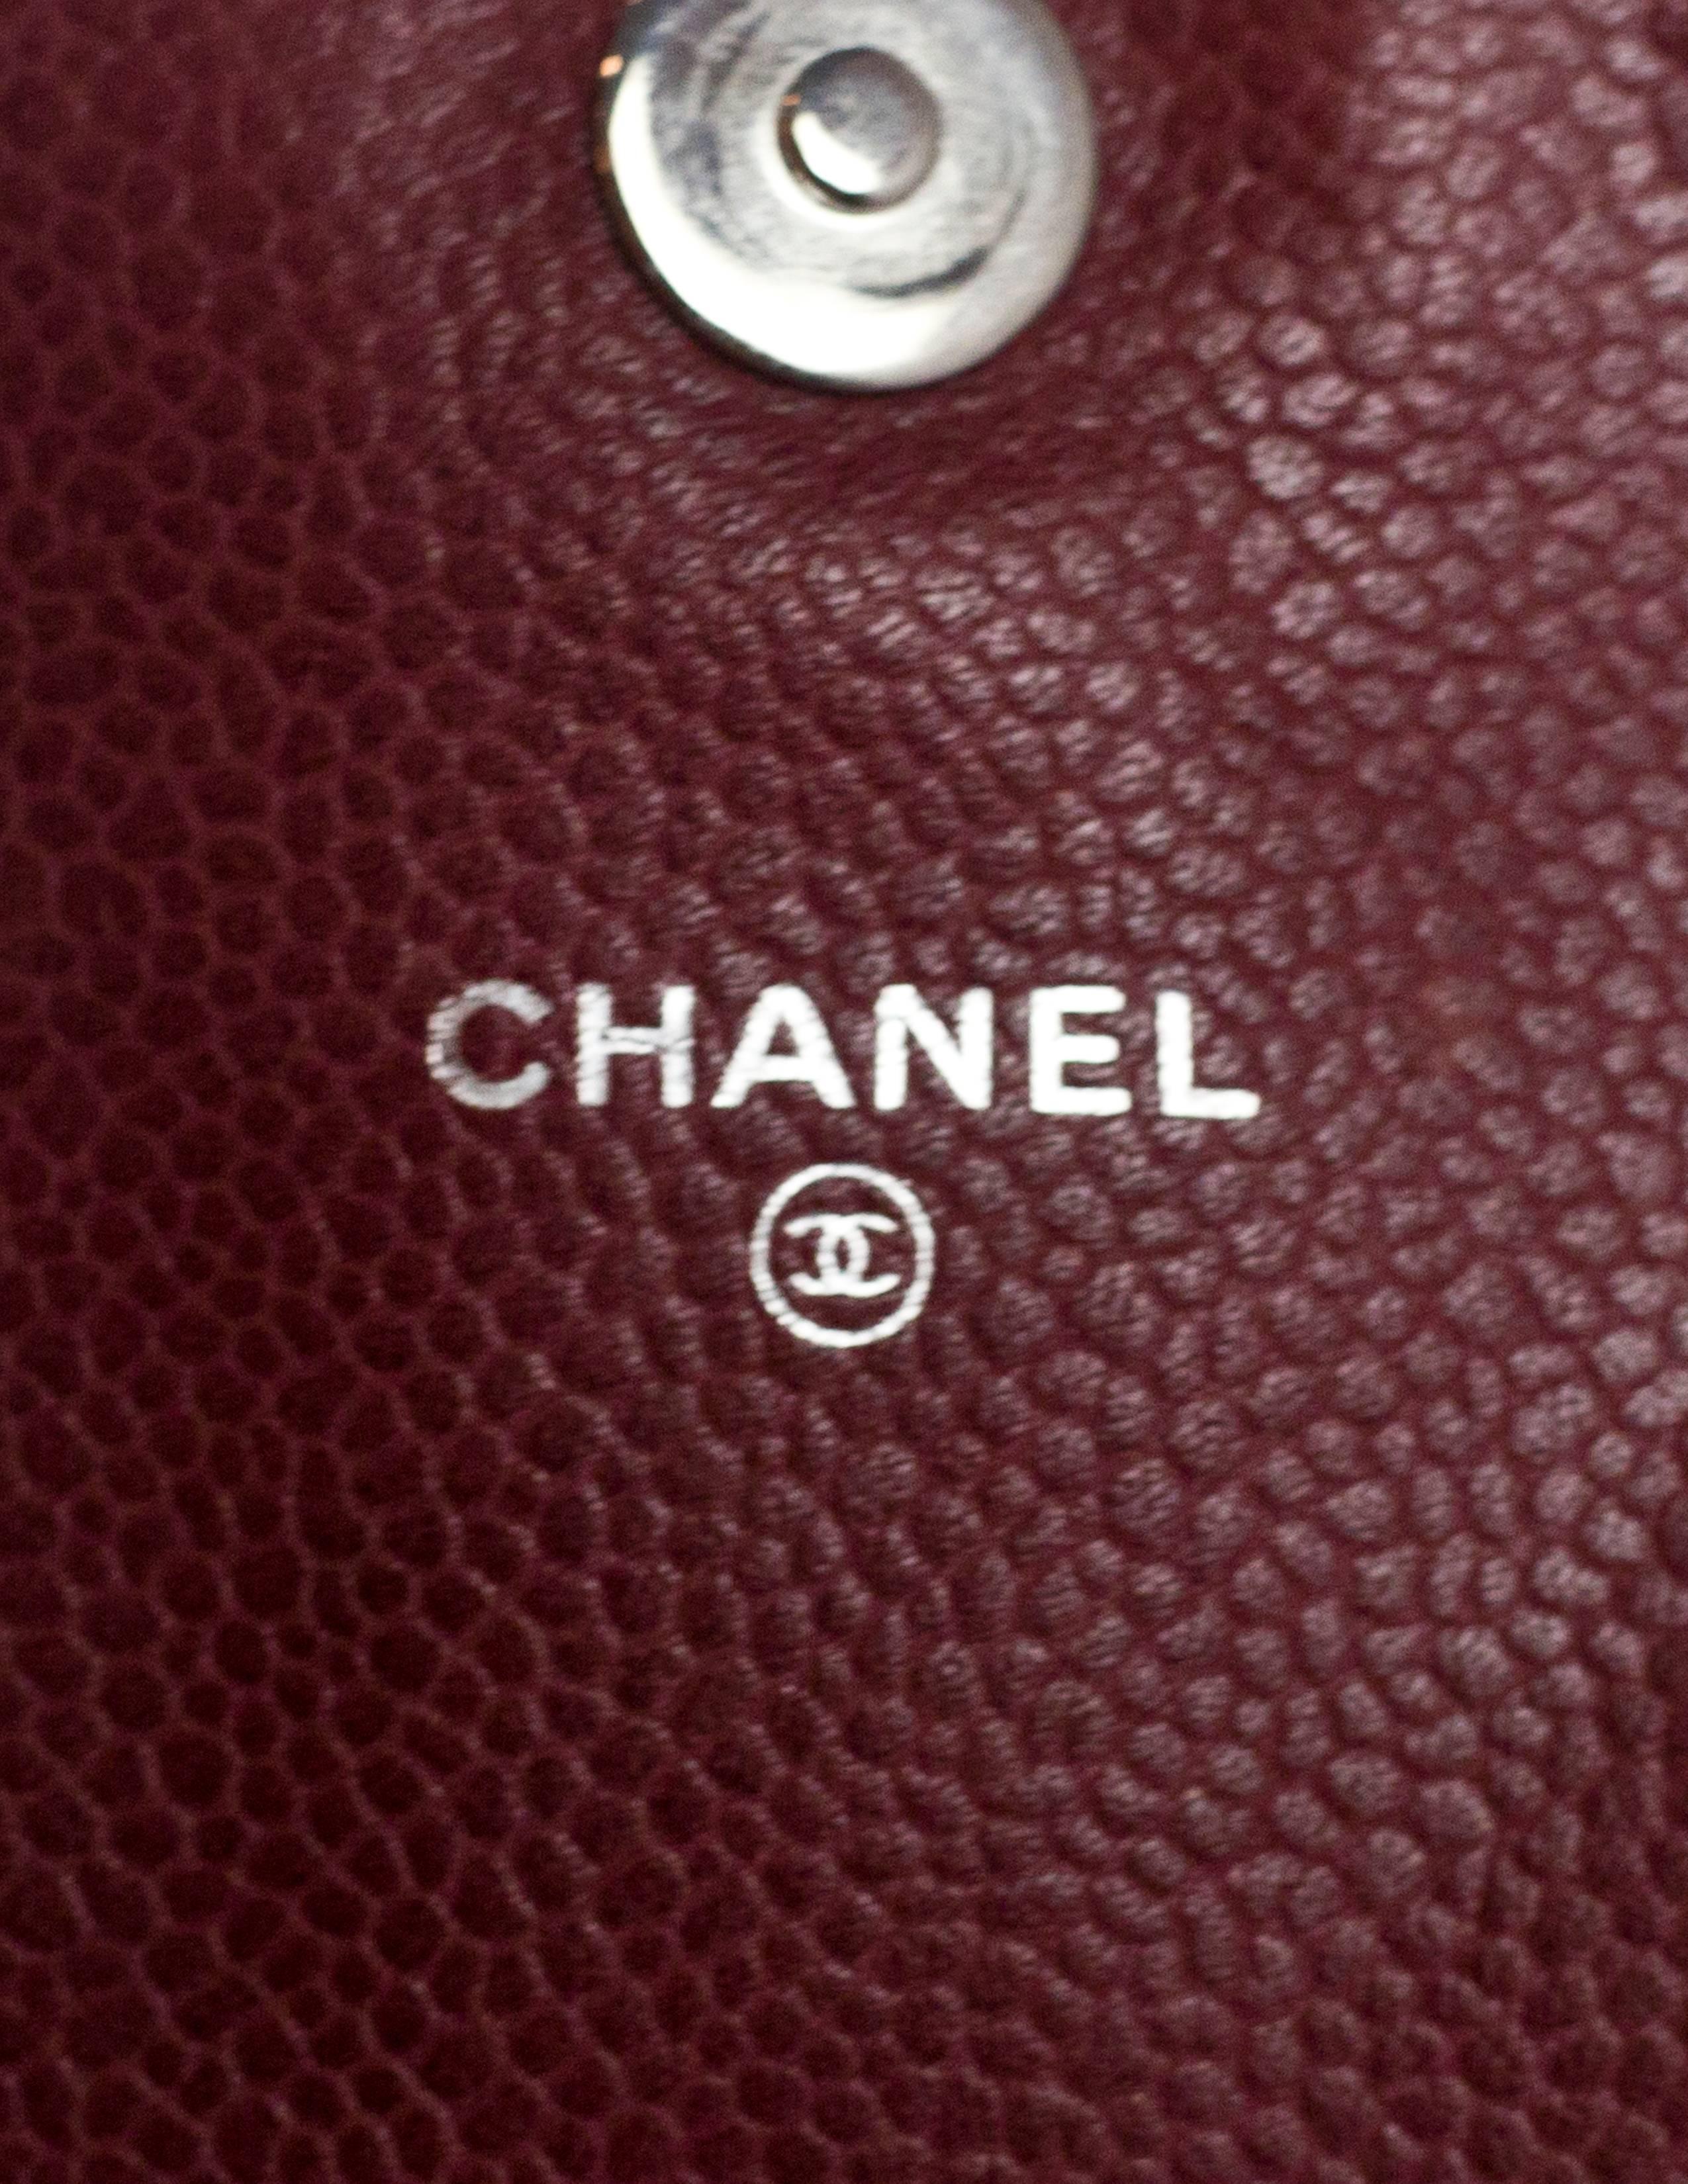 2503d66d3da7 Chanel Burgundy Caviar Leather CC Half Moon WOC Wallet on a Chain Crossbody  Bag For Sale at 1stdibs